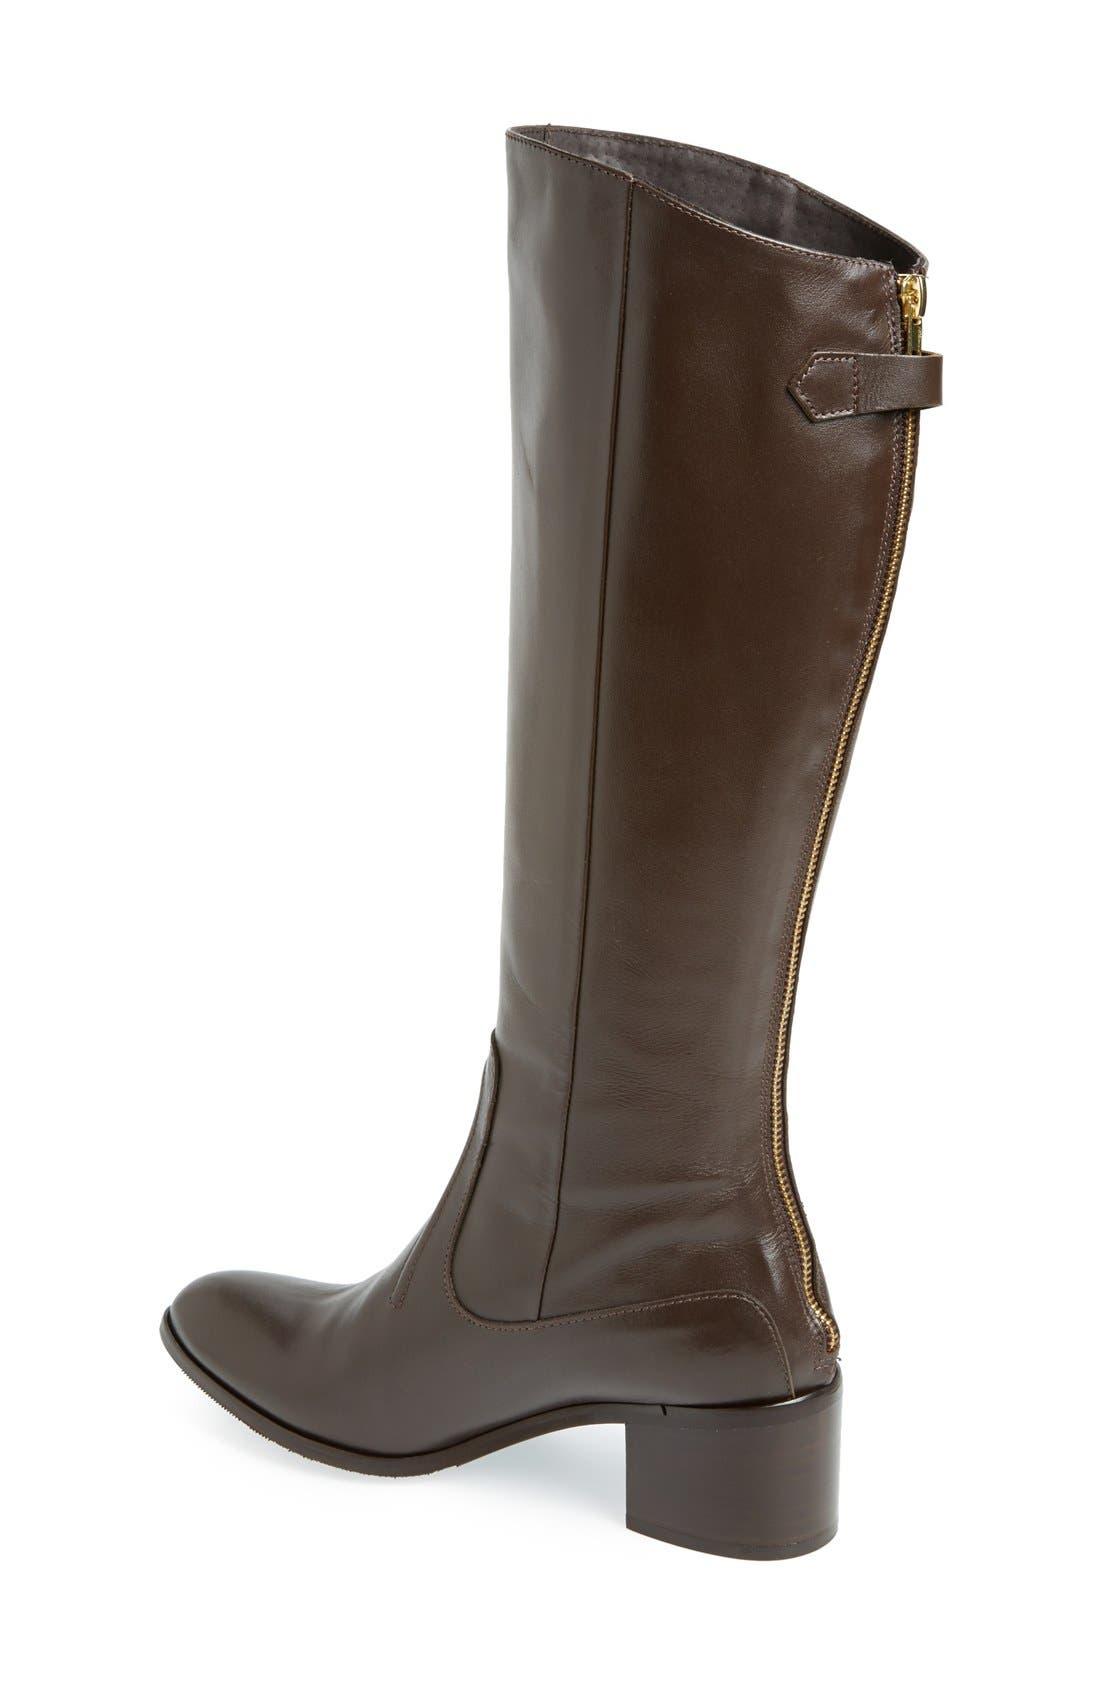 Alternate Image 2  - Charles David 'Ramu' Leather Riding Boot (Women)